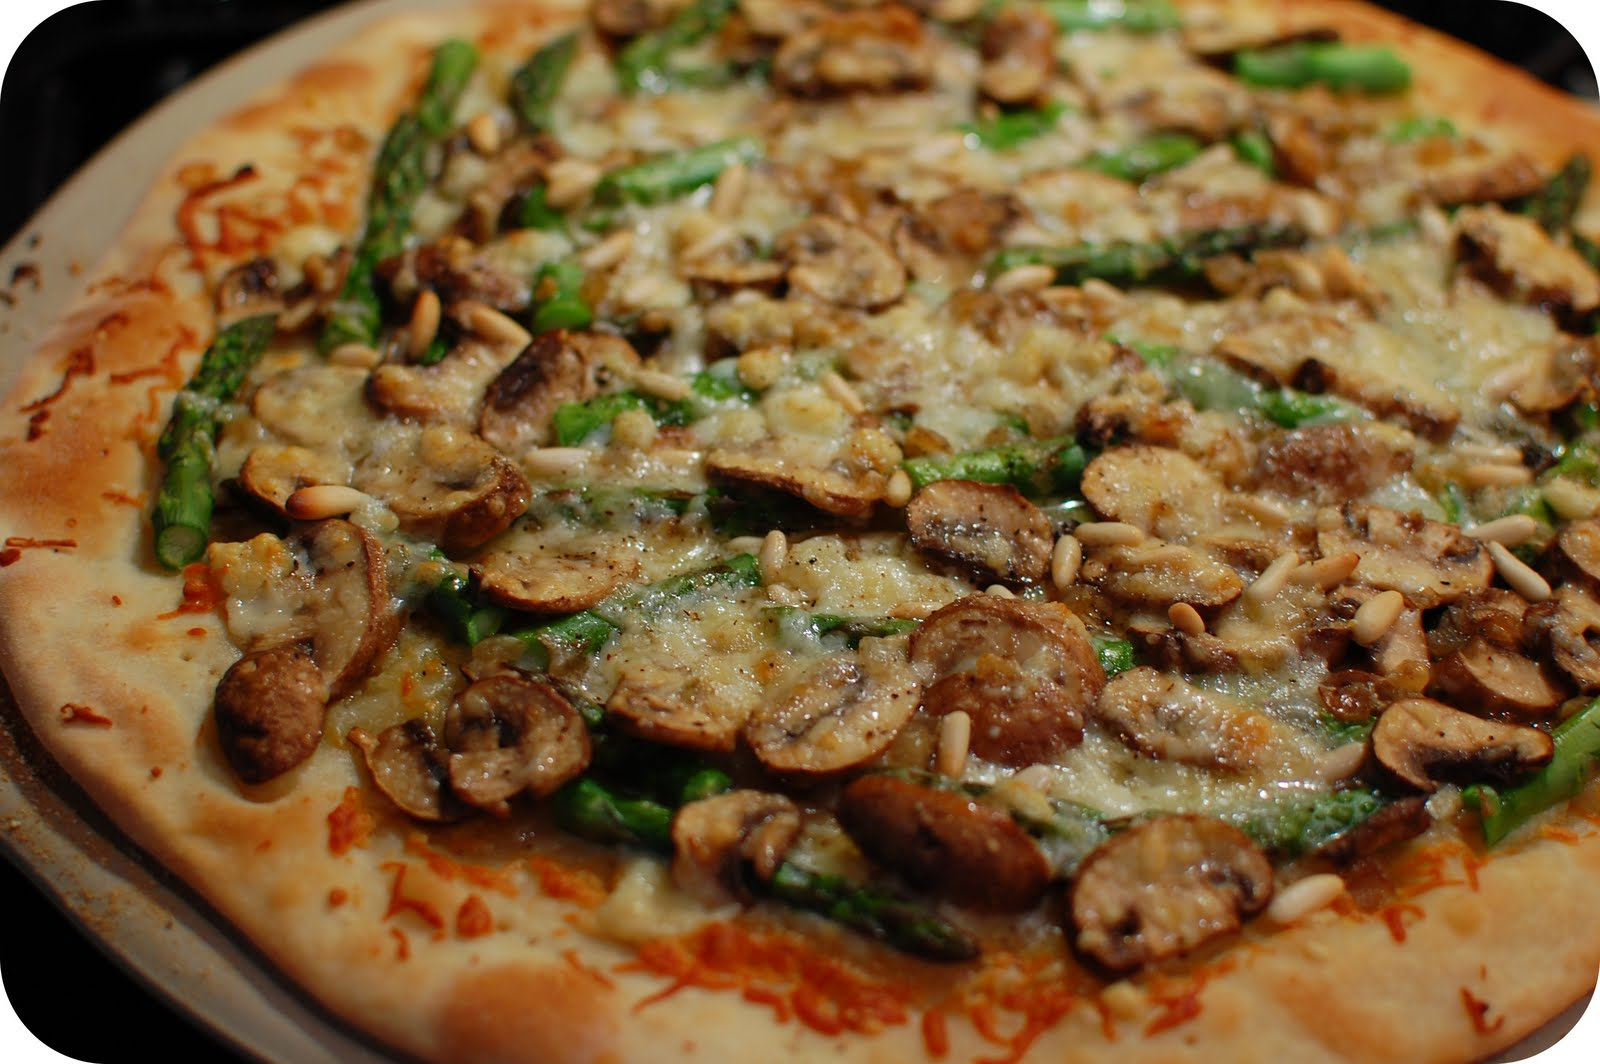 ... of Green: Tasty Tuesdays: Asparagus & Mushroom Pizza with Gorgonzola